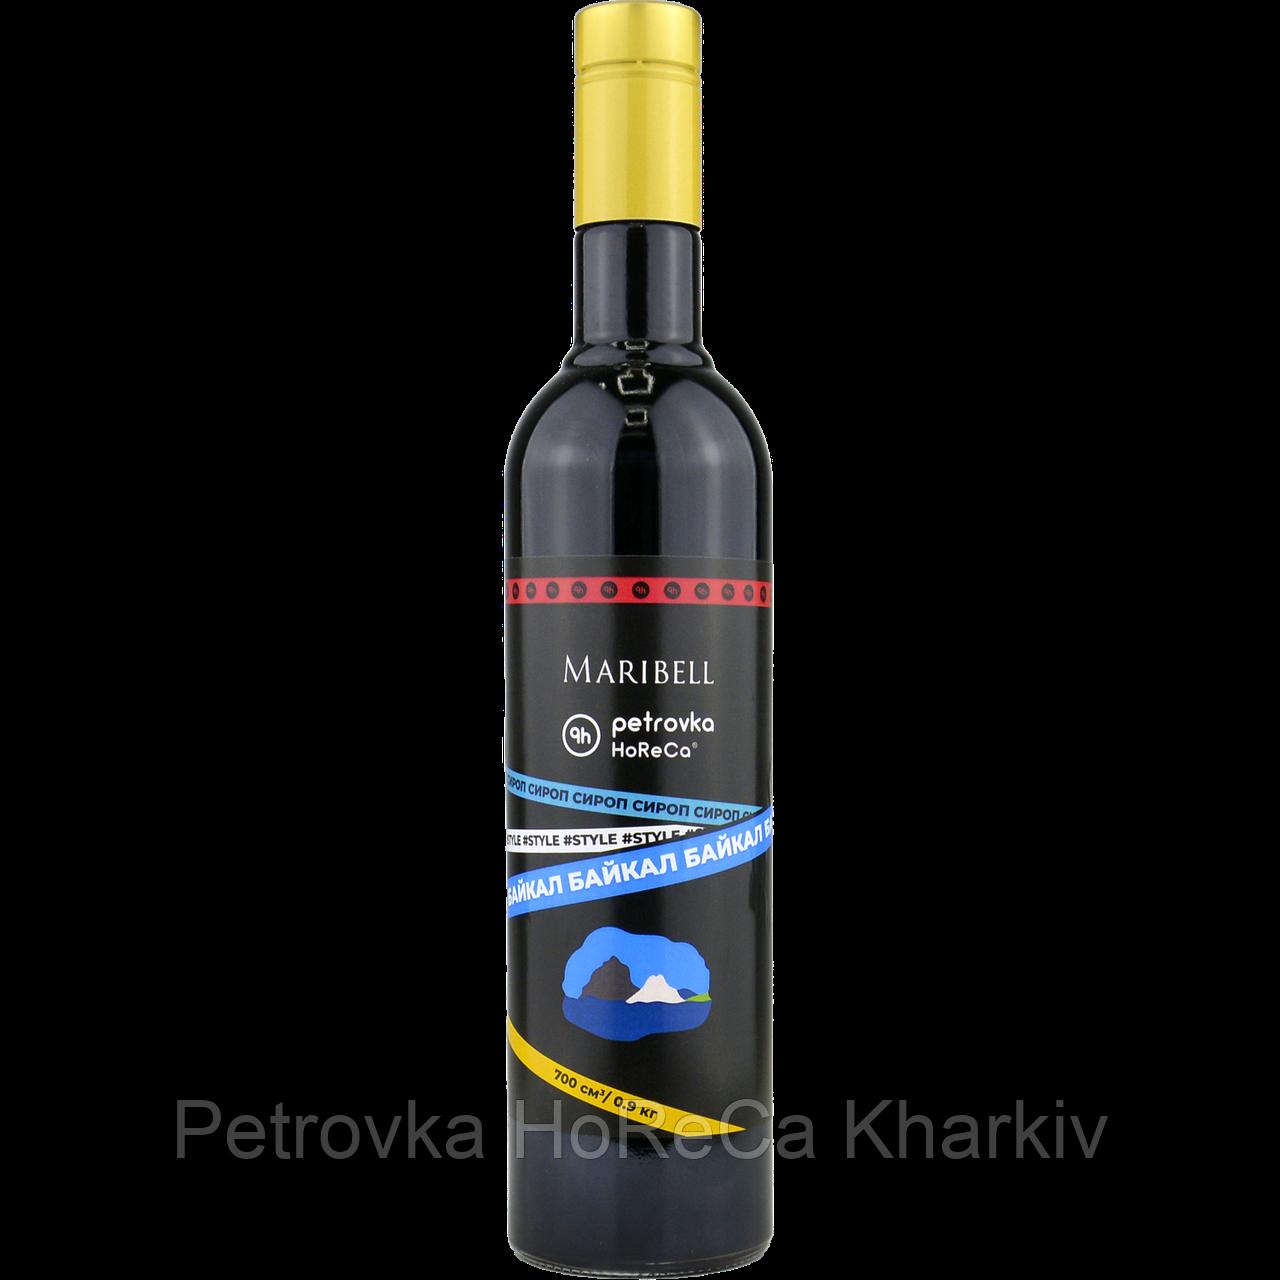 Сироп 'Байкал' для коктейлів Maribell-Petrovka Horeca 700мл